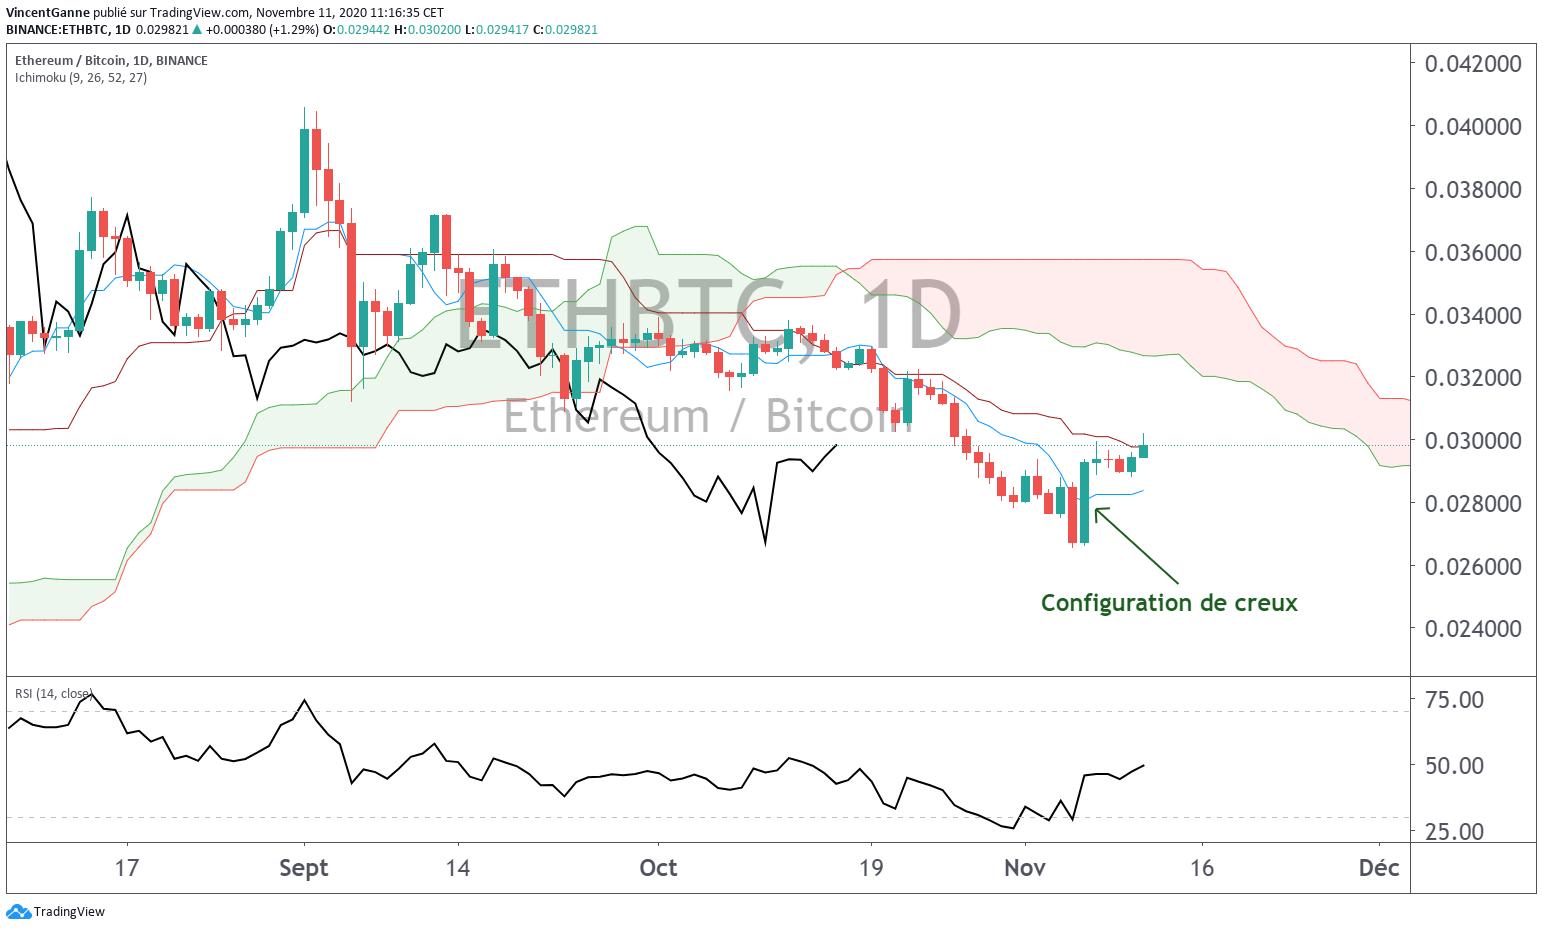 Ratio ETH/BTC